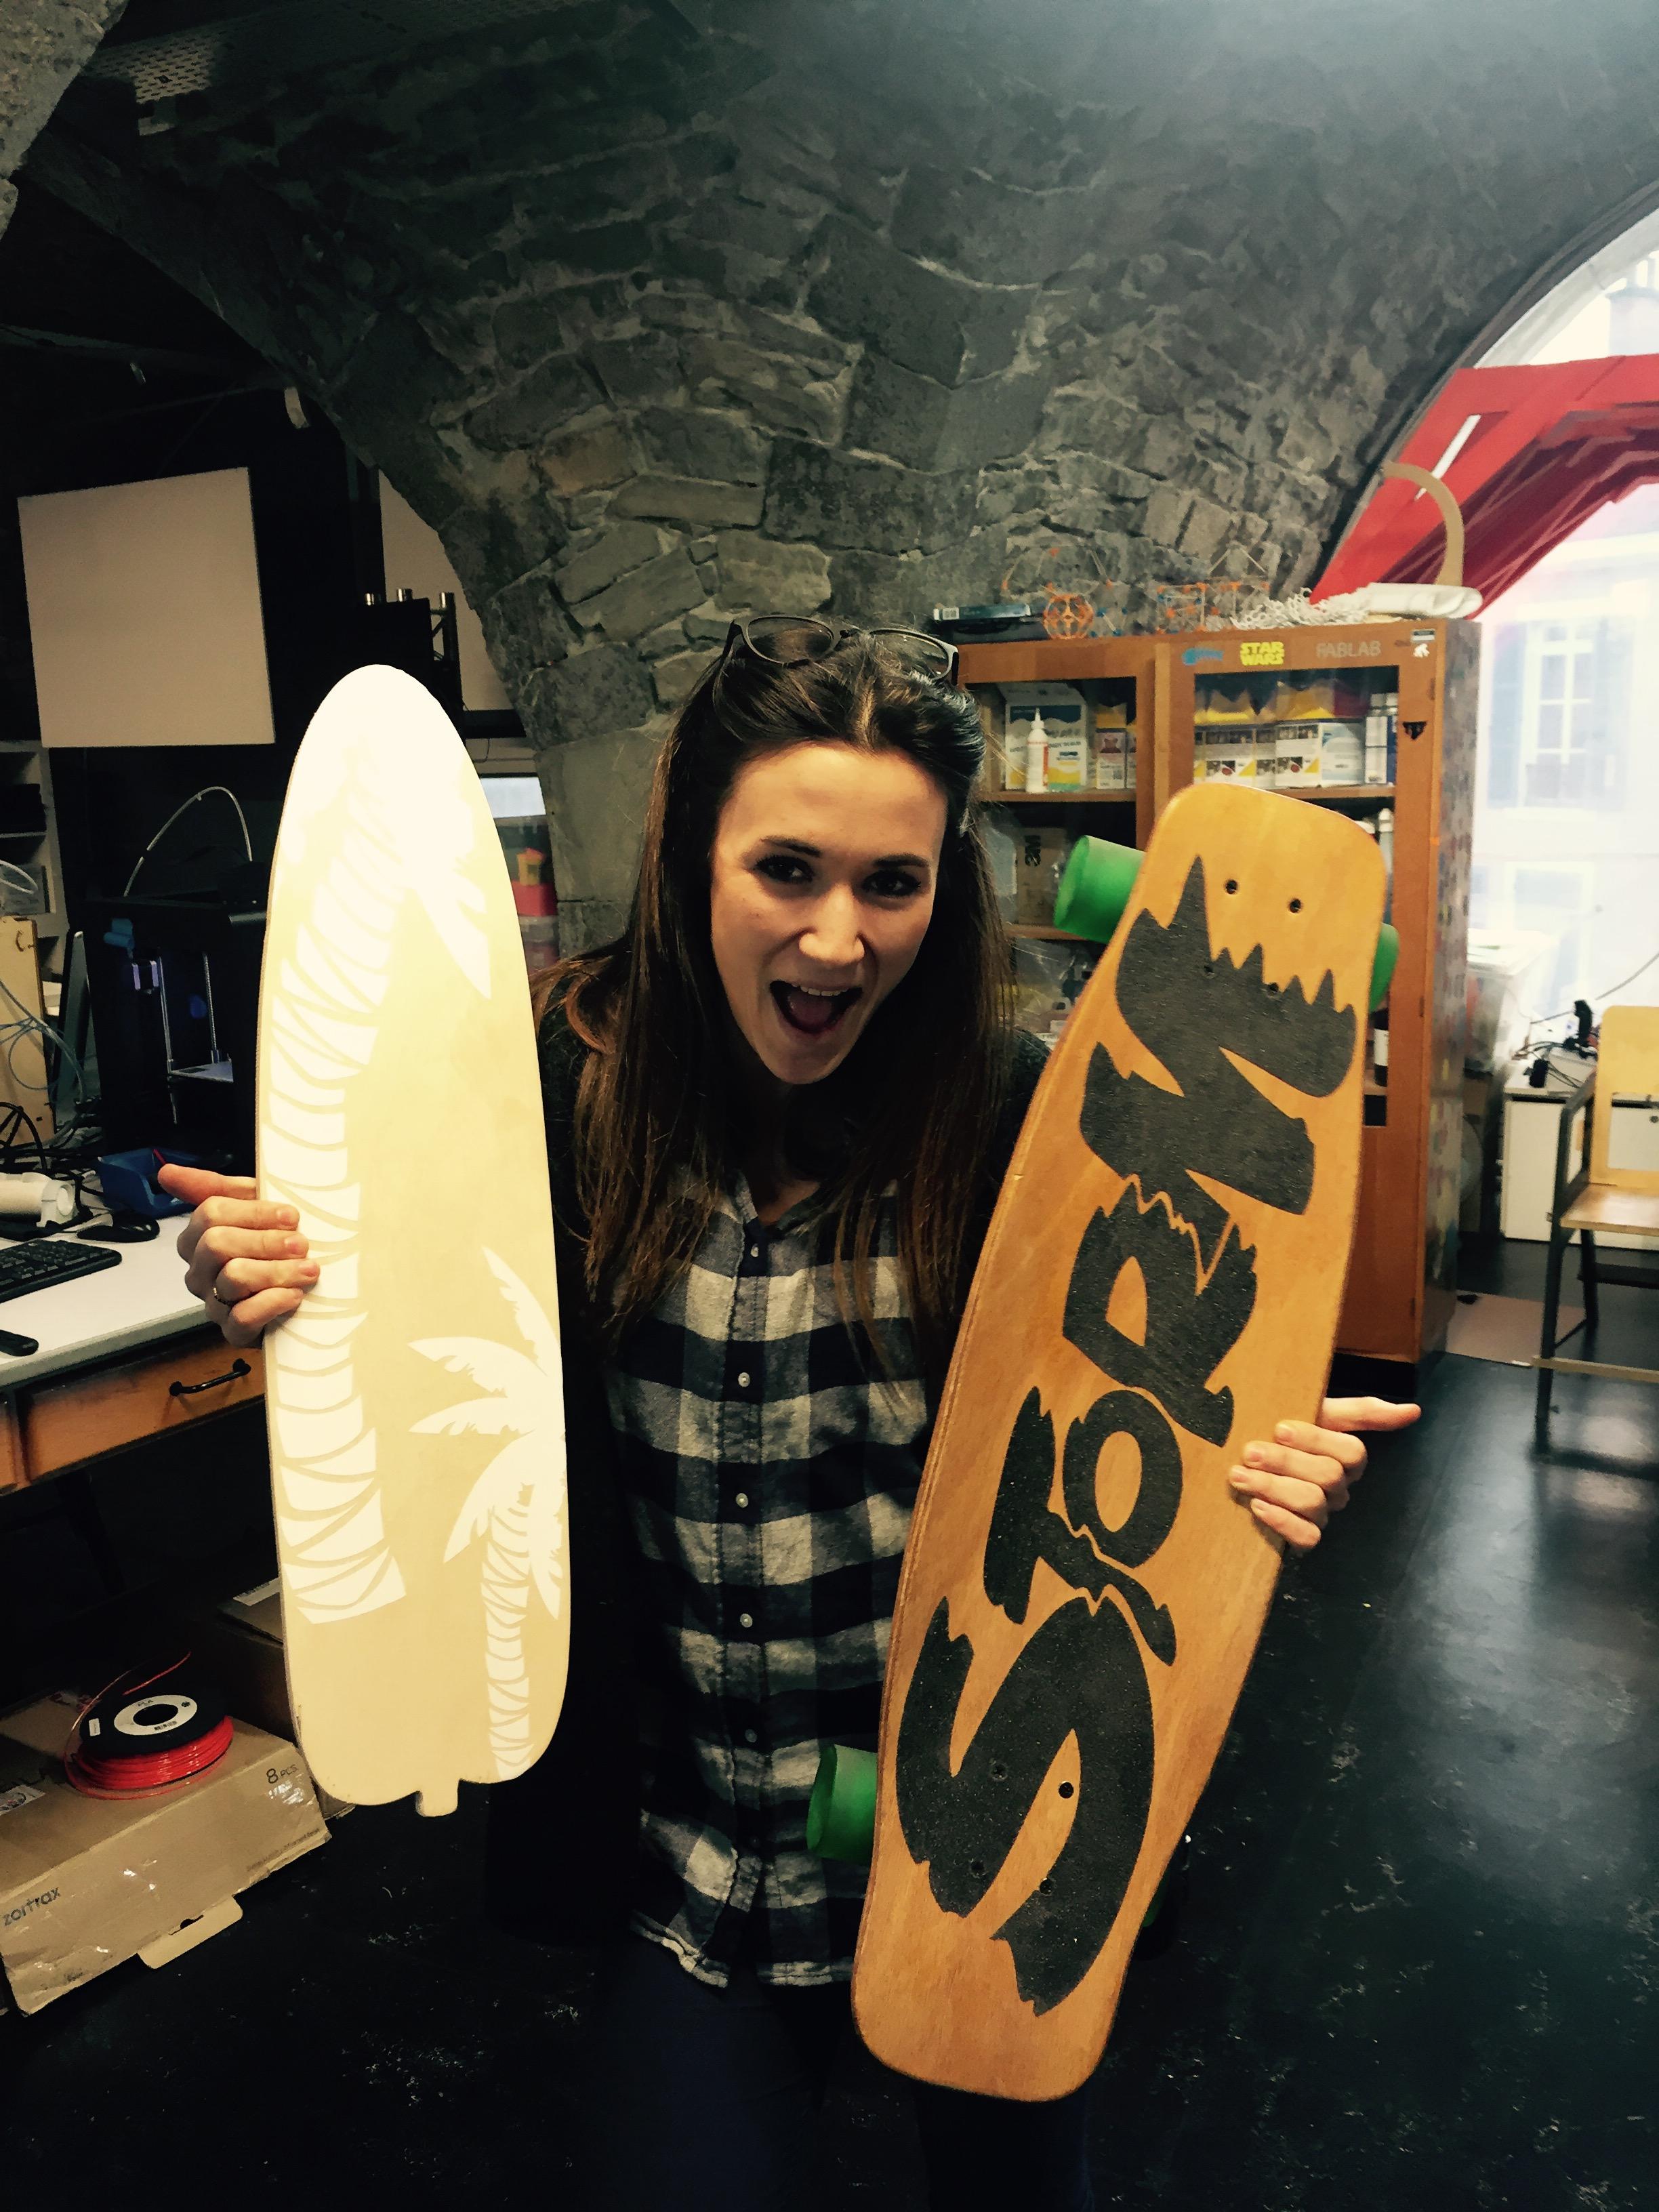 Atelier du fablab cr ation d 39 un skate co responsable les antennes - Creer son skateboard ...